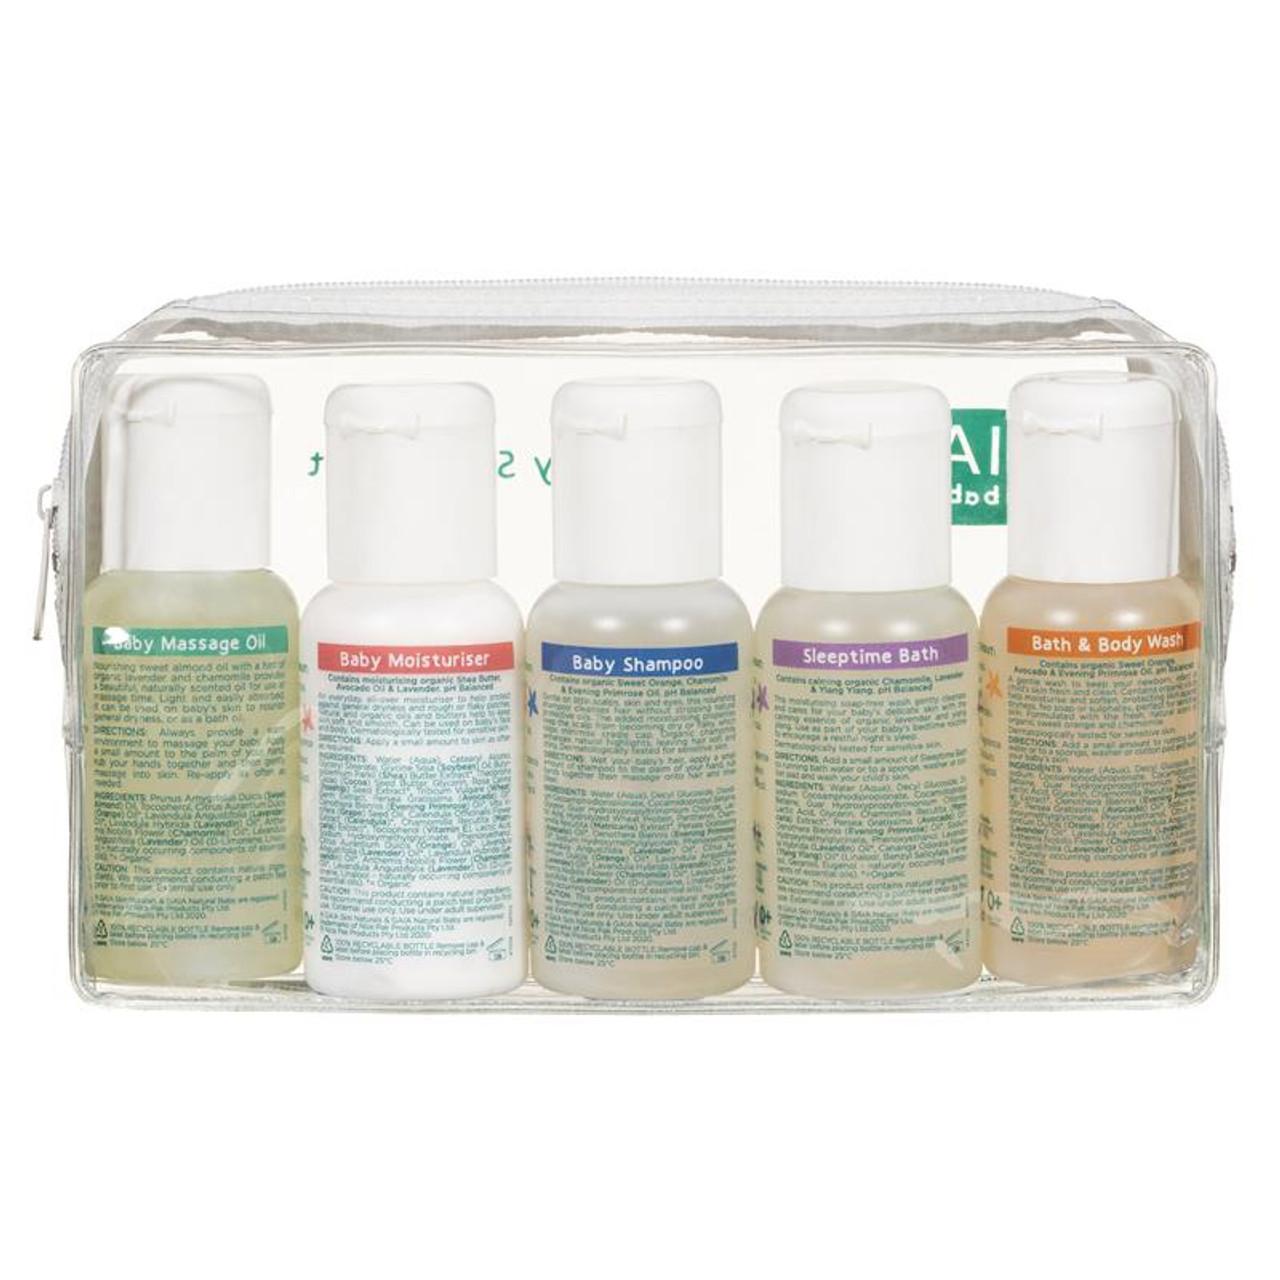 Gaia Natural Baby 50ml 5pk Starter Kit at Baby Barn Discounts 50mL refillable mini flip-top bottles of GAIA Natural Baby